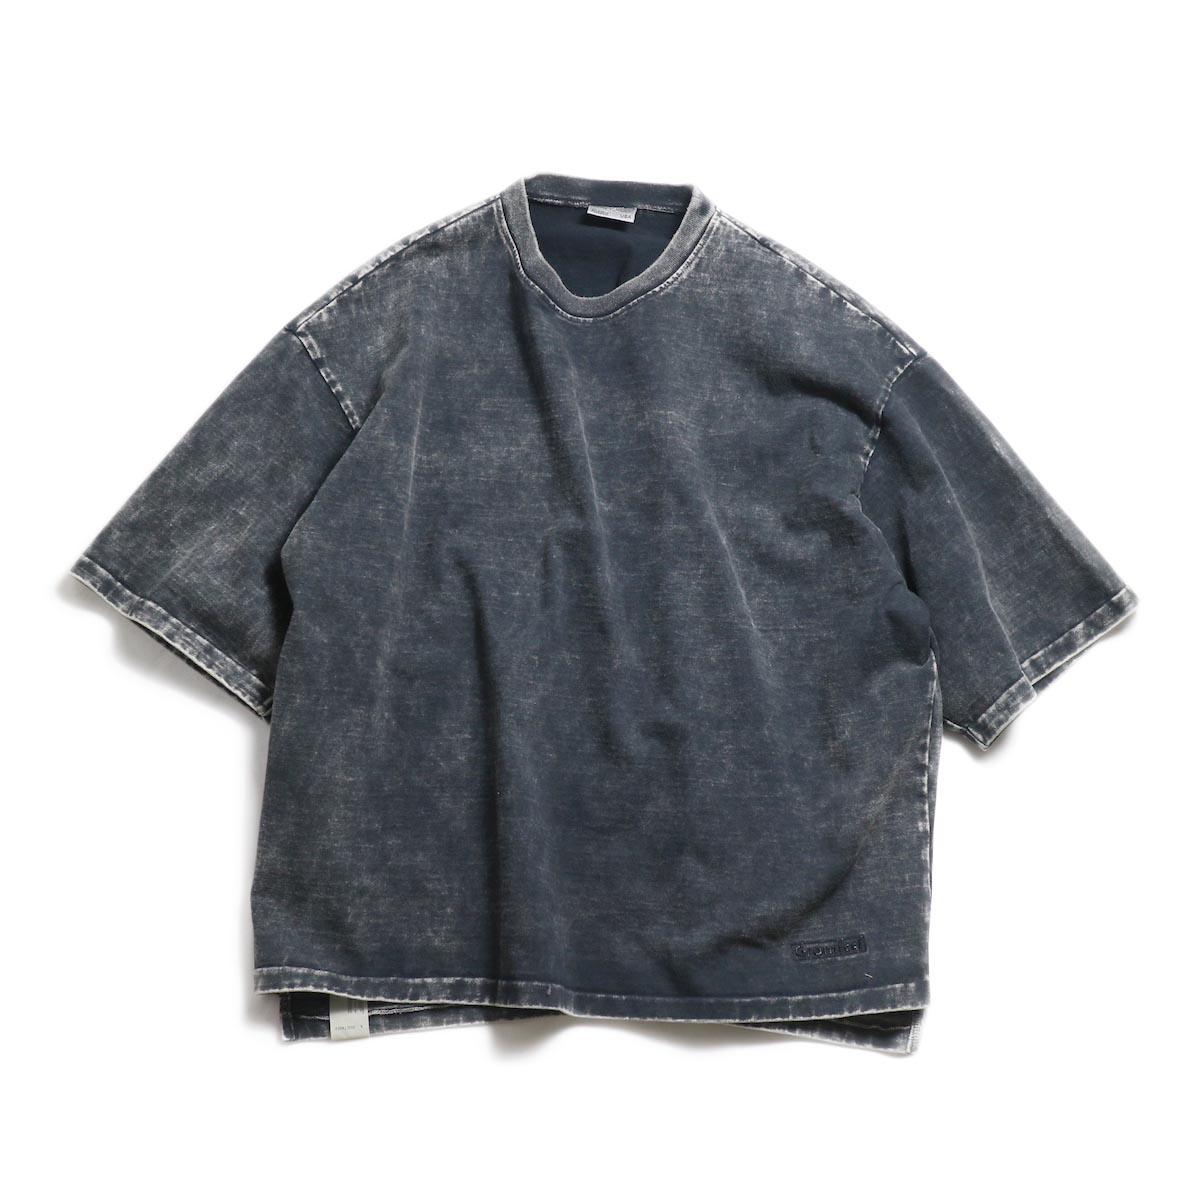 N.HOOLYWOOD × Gramicci  / 191-CS27-024 Short Sleeve Tee -Black